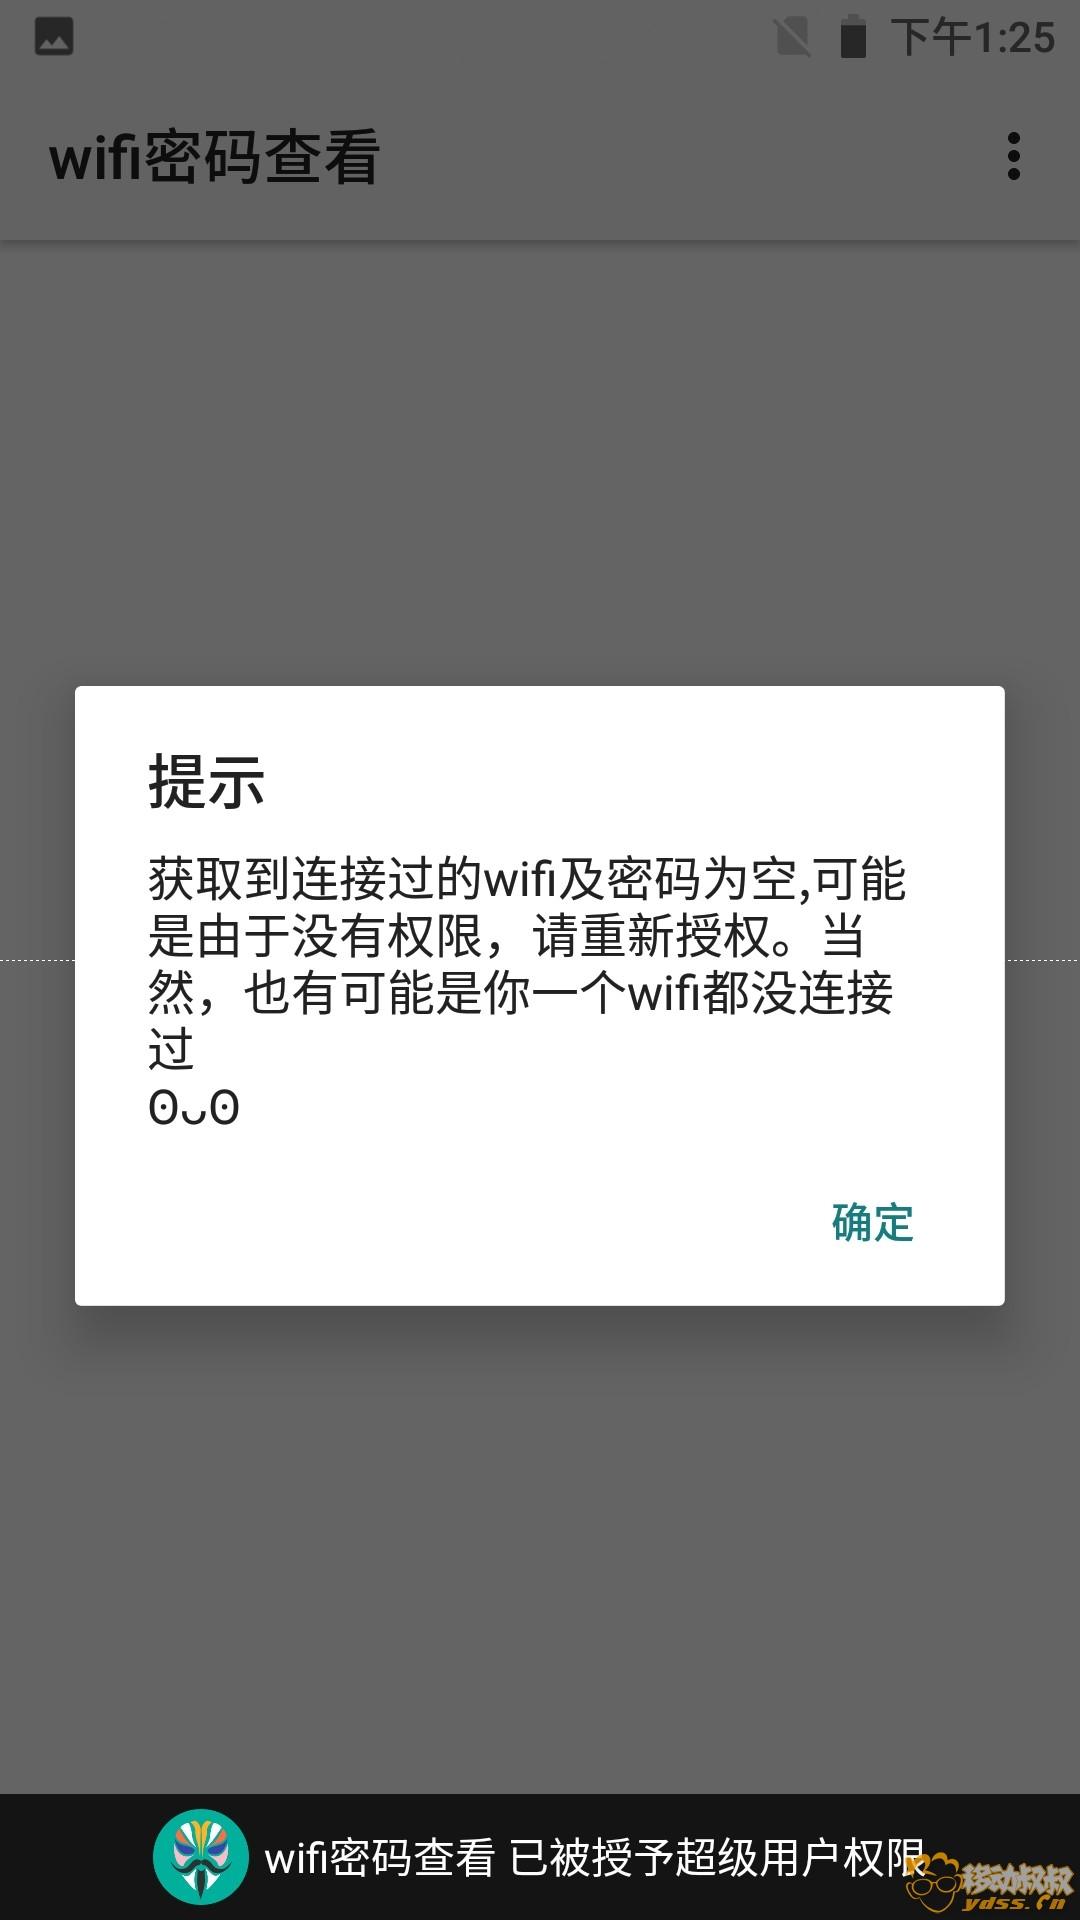 New0748Screenshot_wifi密码查看_20180607-132509.jpg